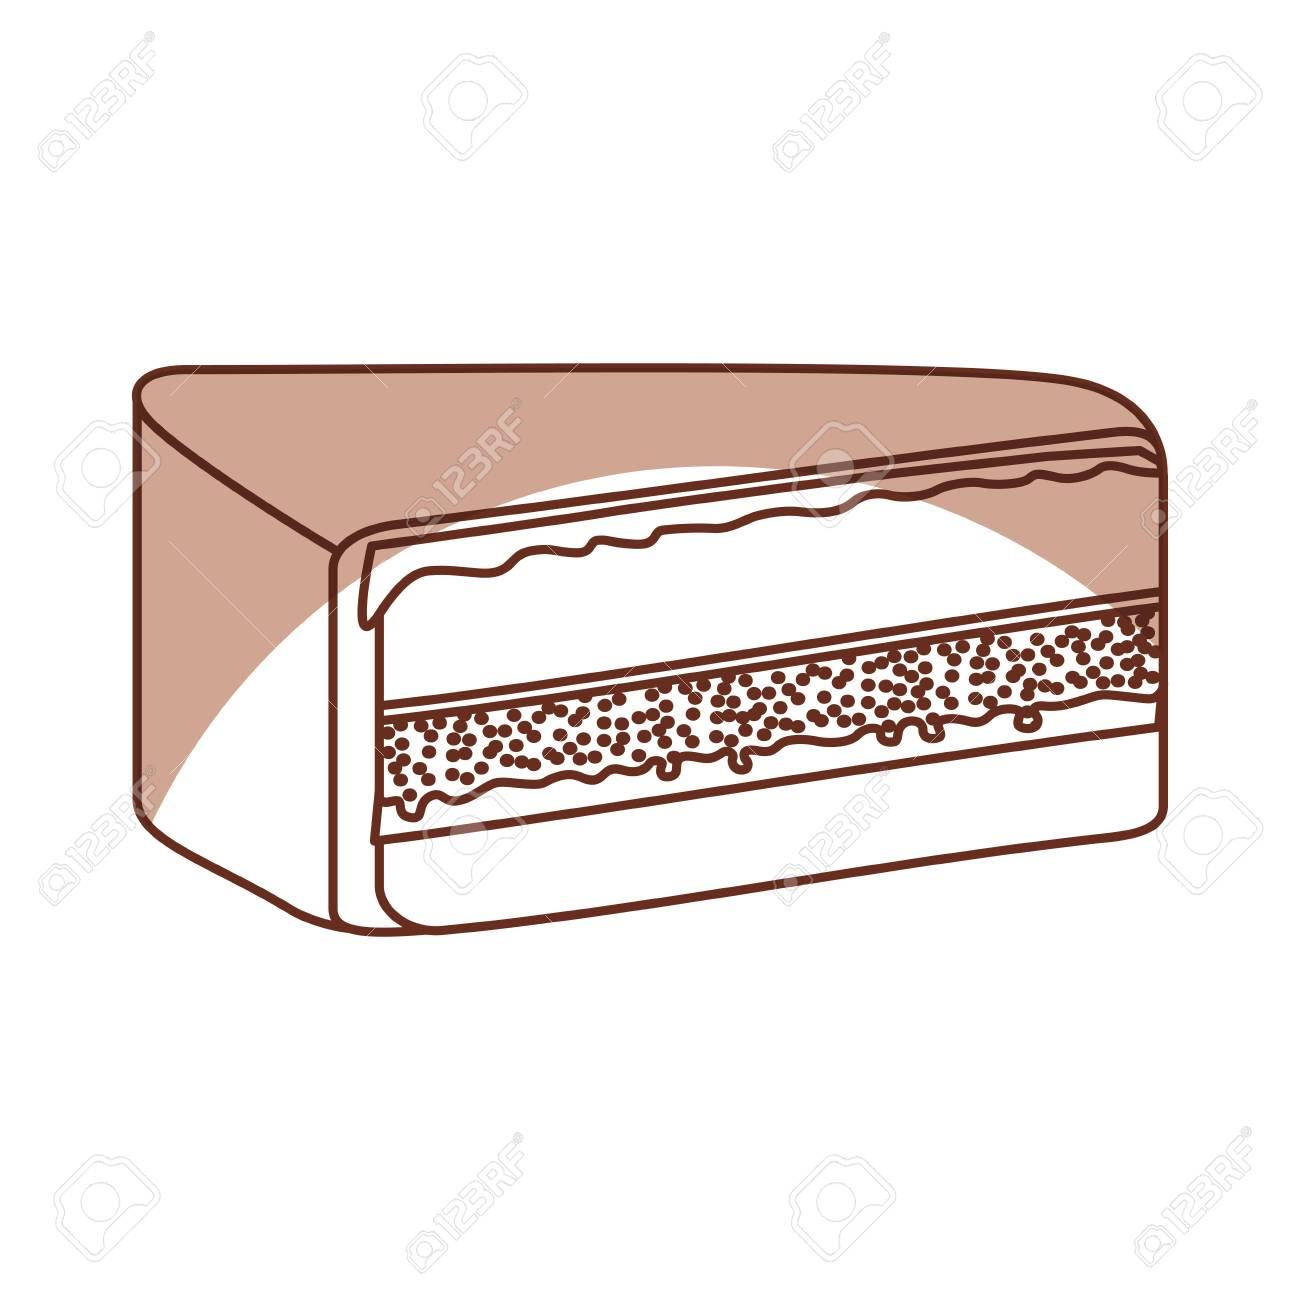 04c1fd439438 Vector - yummy sweet cake slide piece vector illustration graphic design